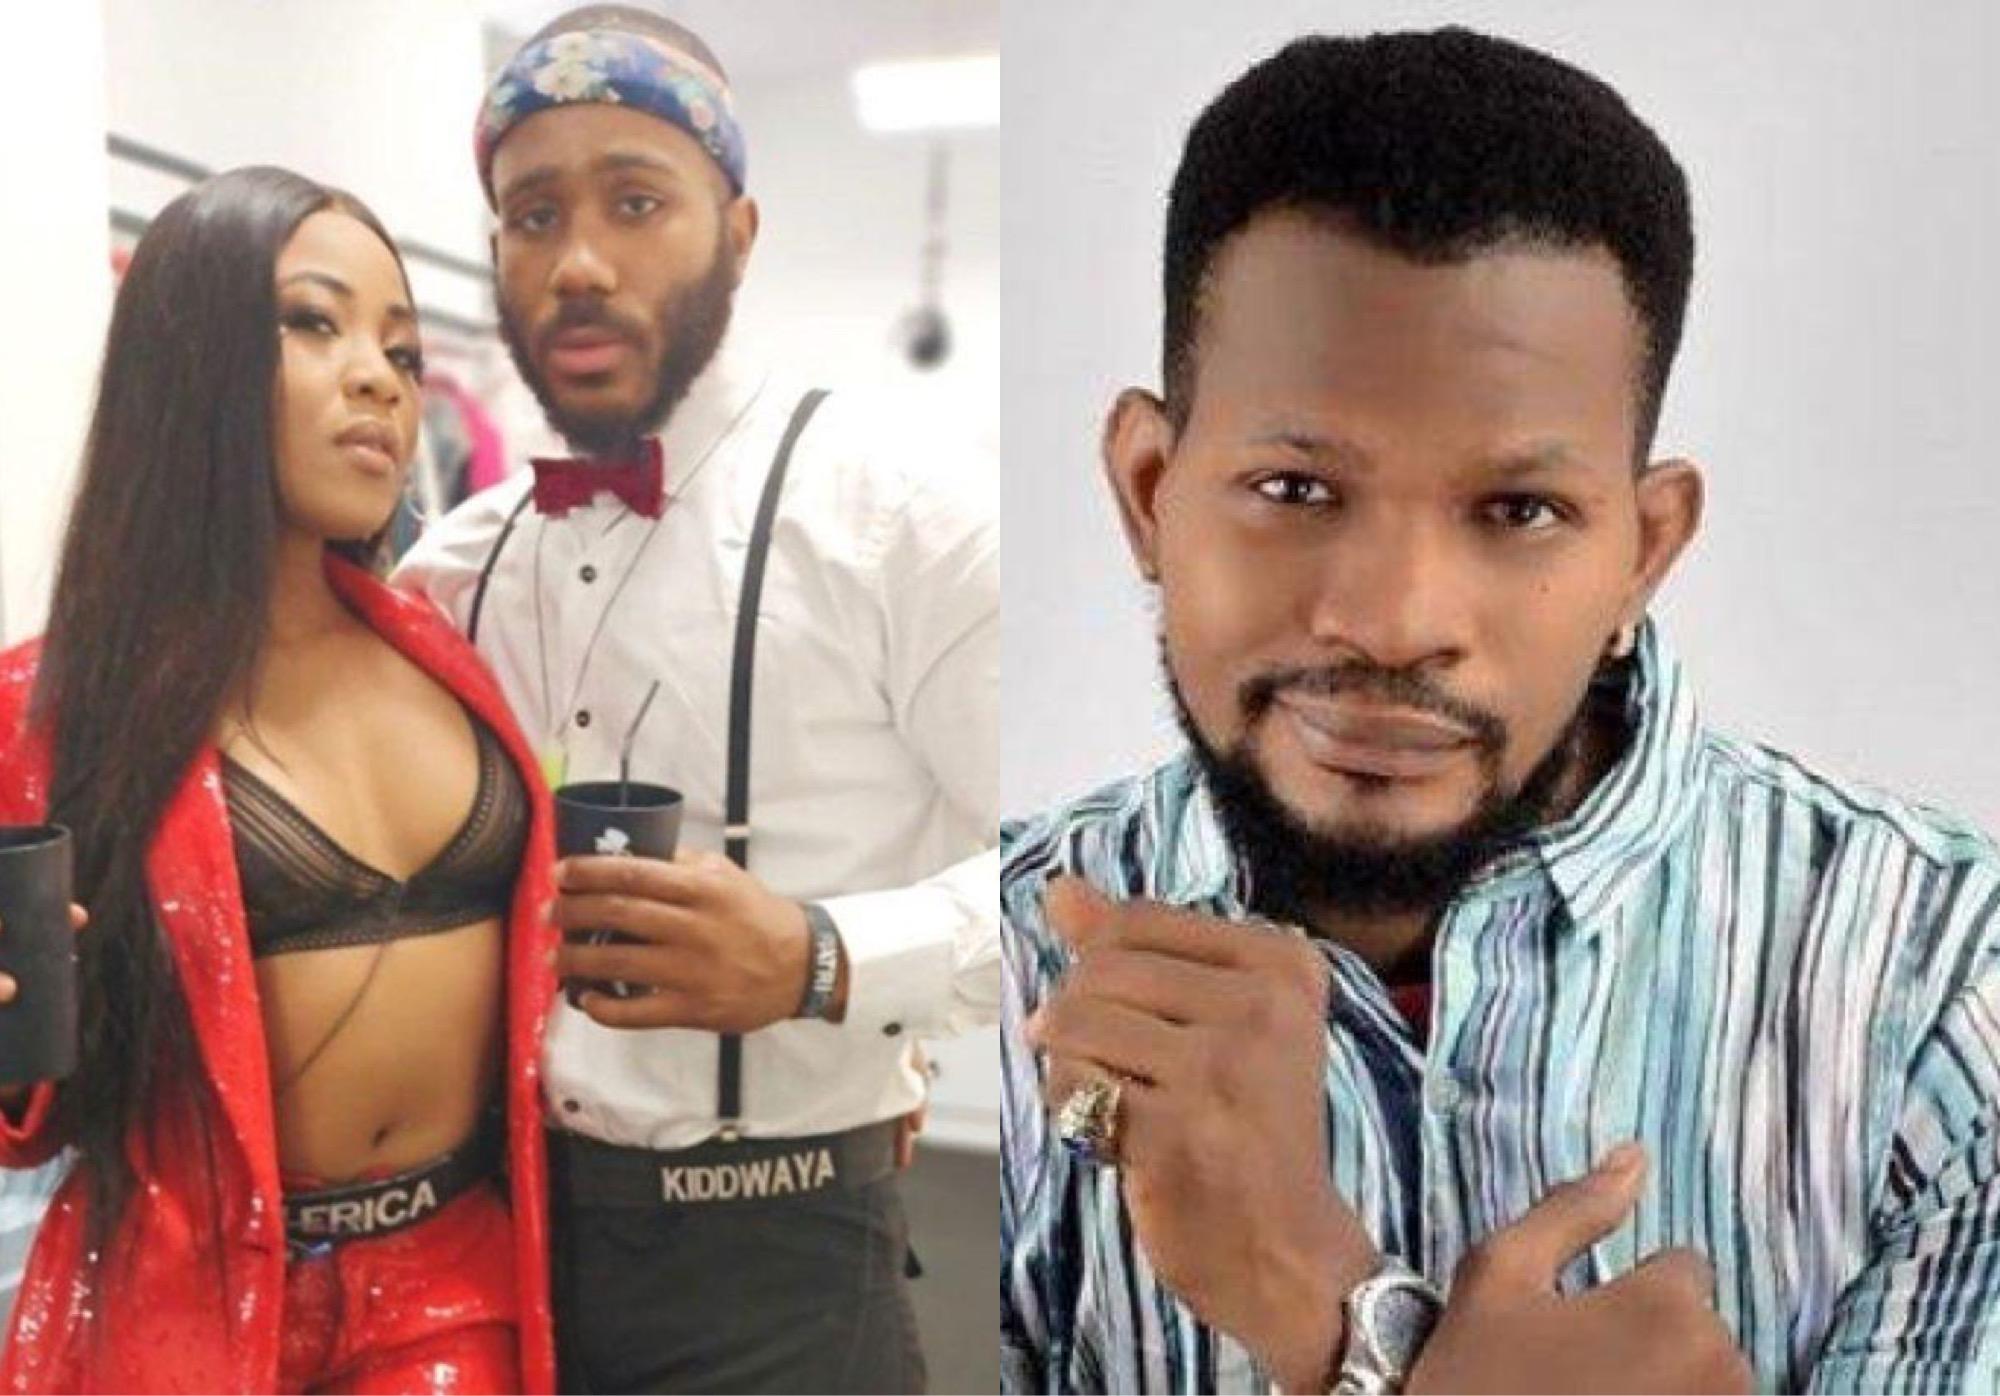 'Erica Made You Famous' - Uche Maduagwu Chides Kiddwaya Over Breakup Rumors